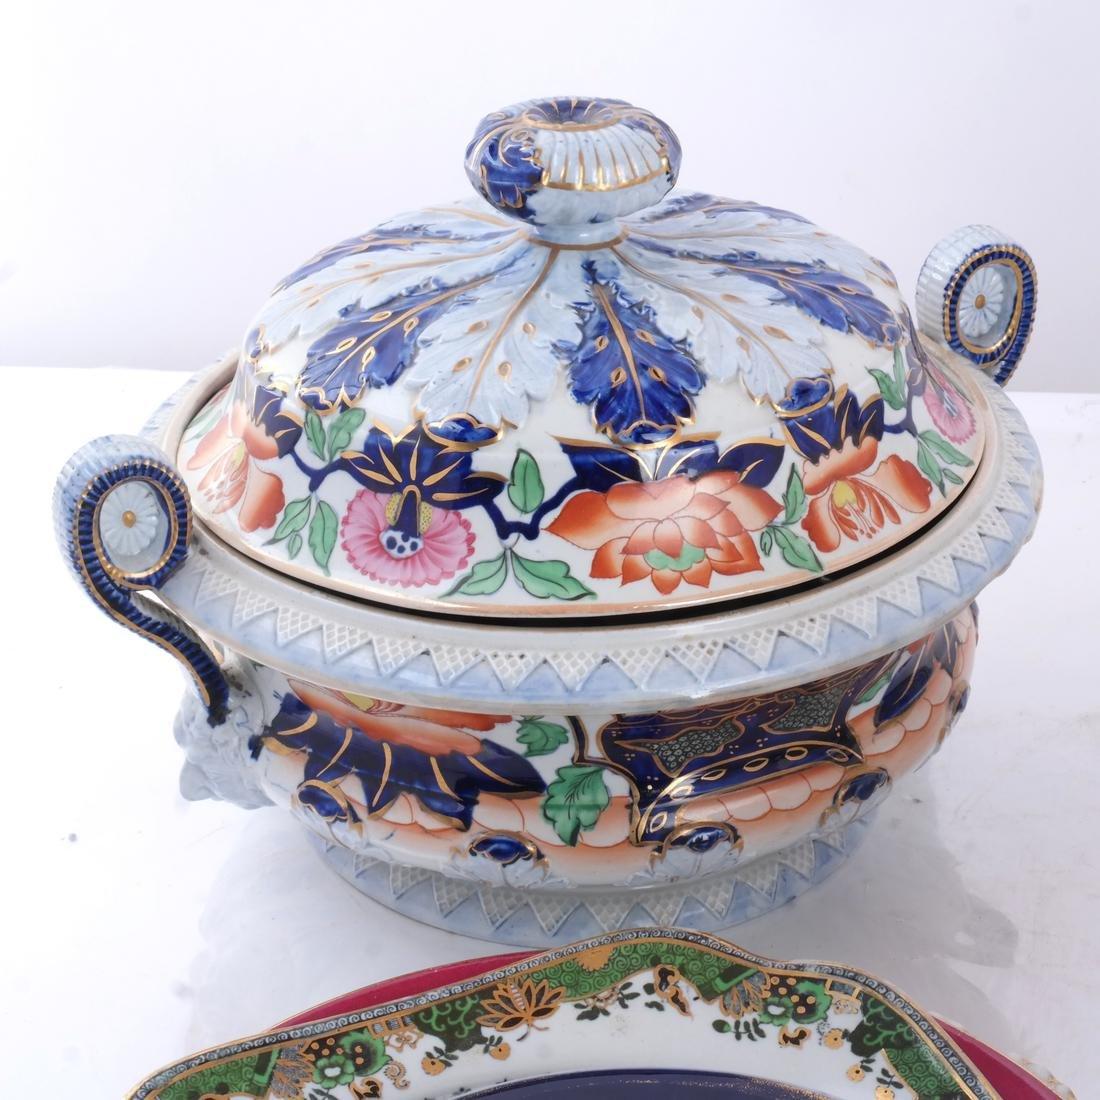 Assorted Porcelain Dessert/Dinnerware - 2